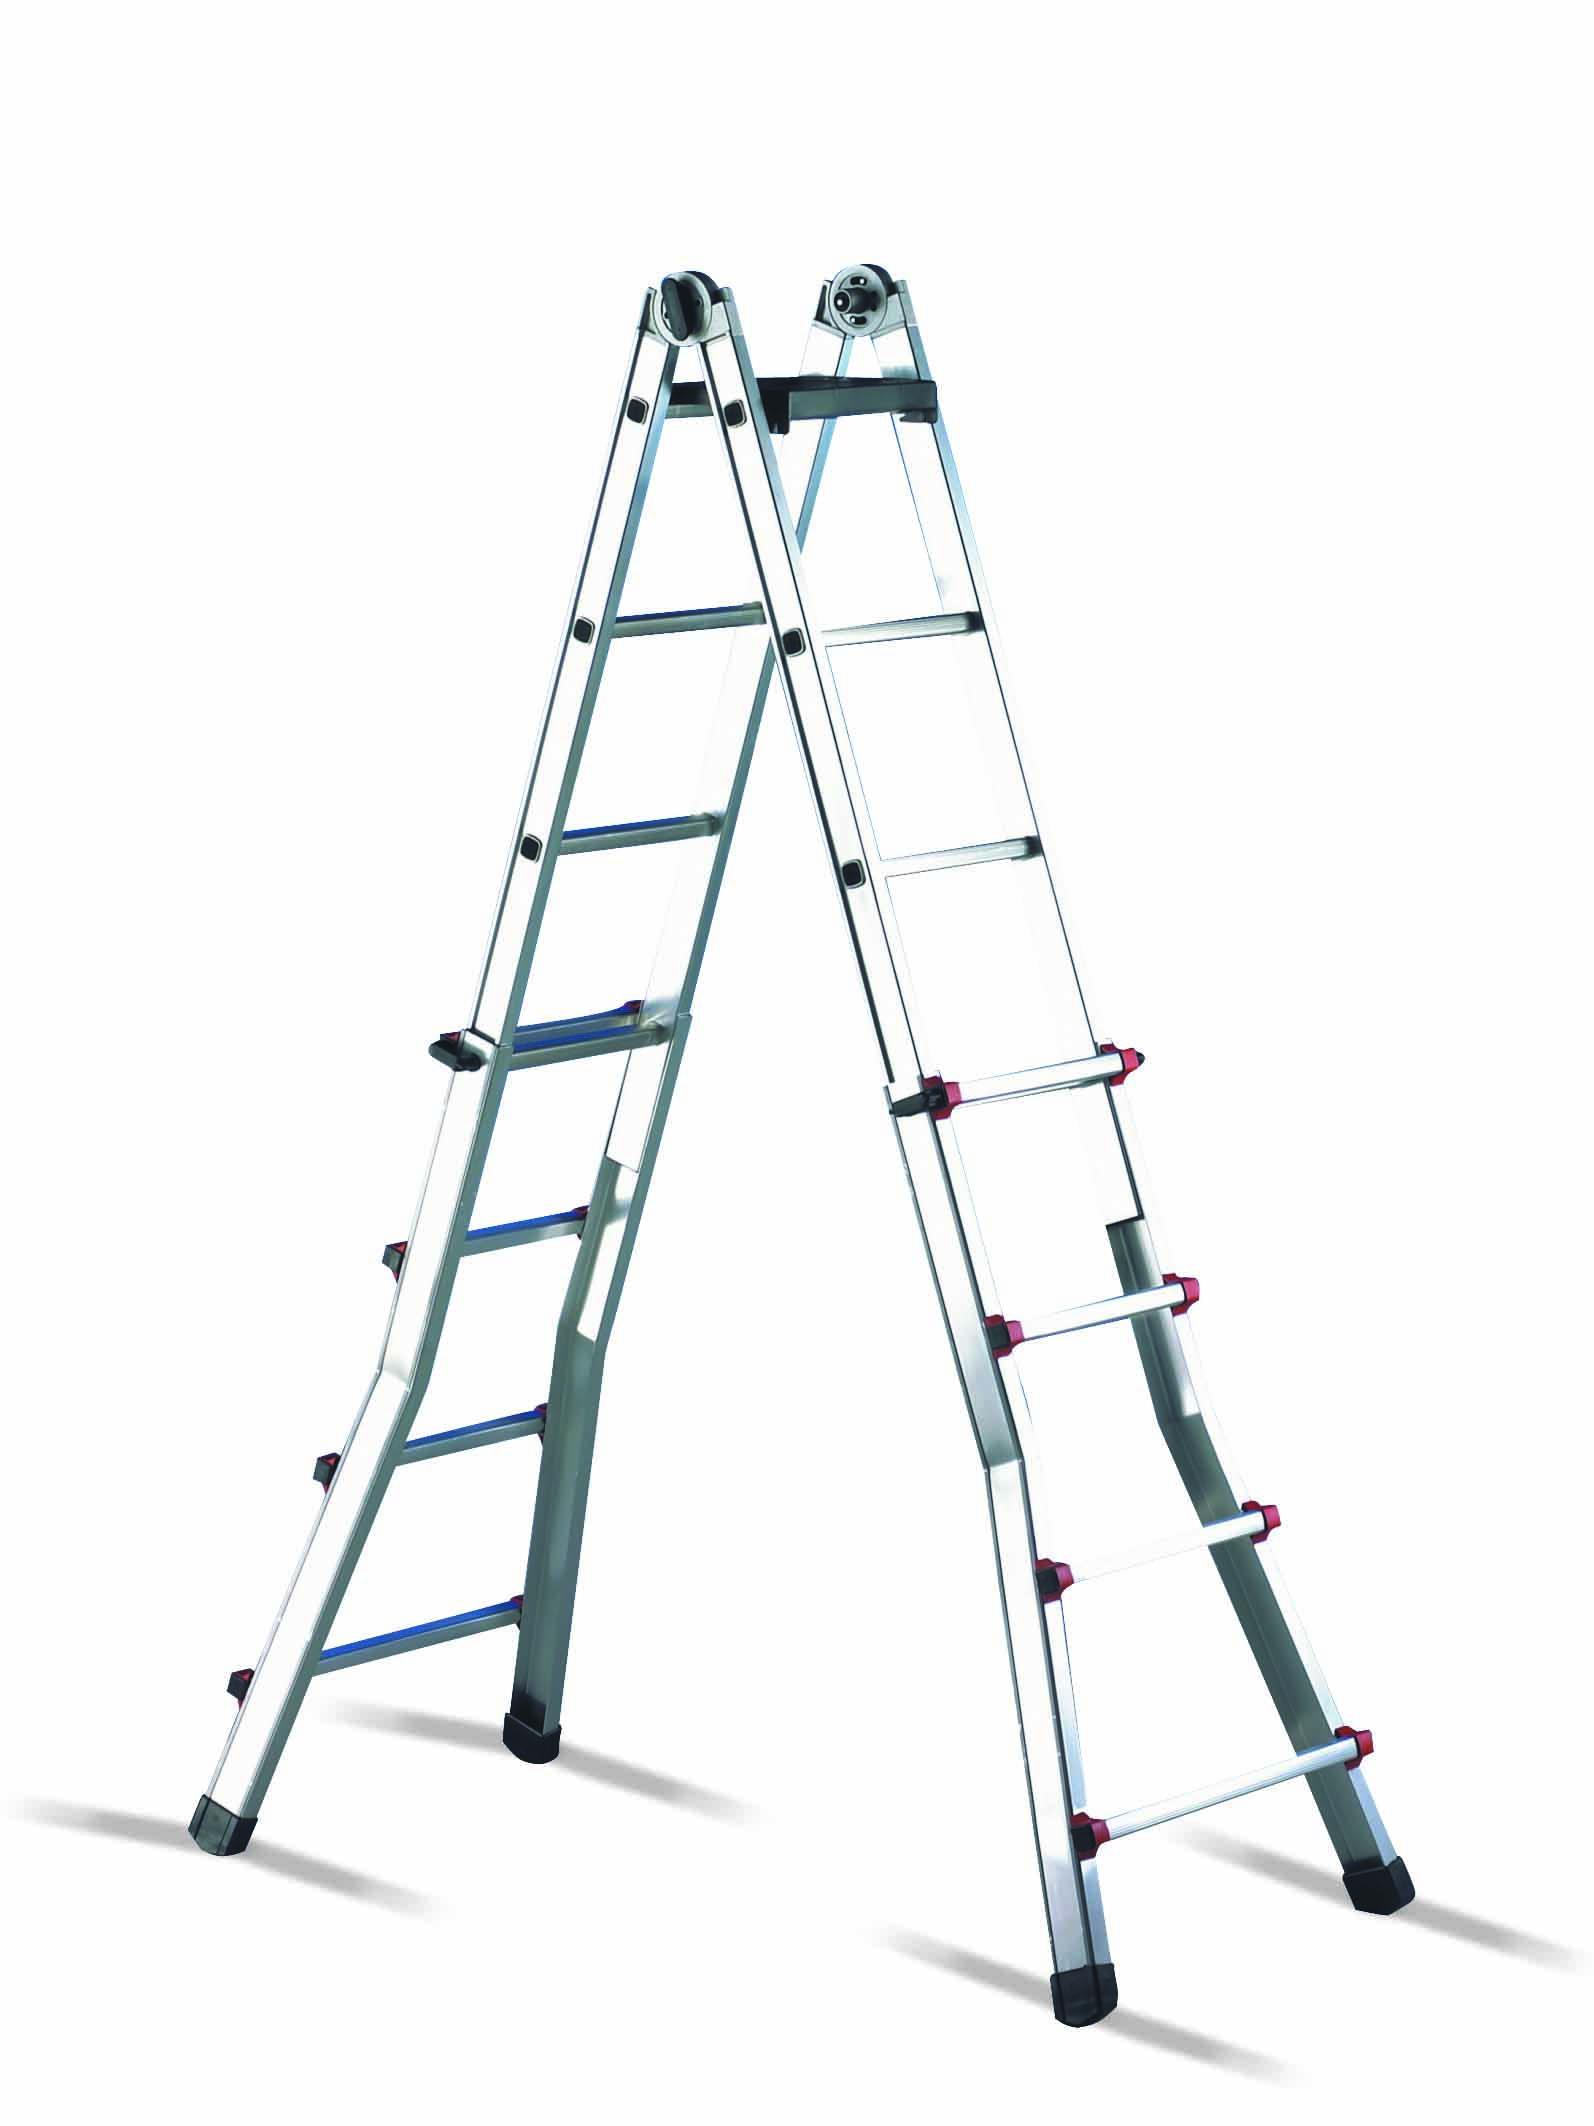 cimco 146707 h henverstellbare aluminium teleskop leiter 2 x 7 stufen h he 1 25m bis 3 55m. Black Bedroom Furniture Sets. Home Design Ideas